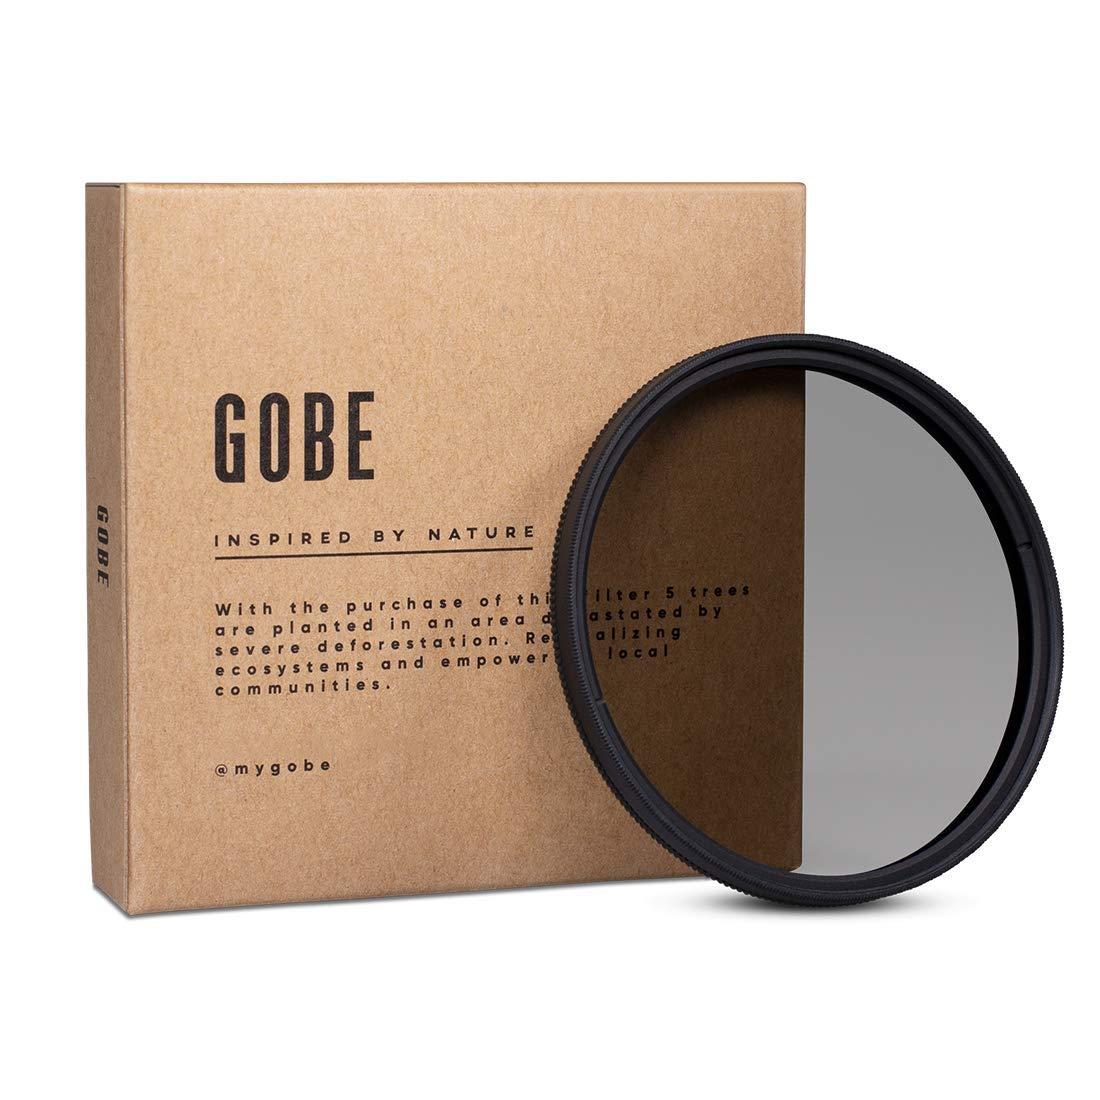 Gobe CPL 82mm Japan Optics Slim Polarized Filter by Gobe